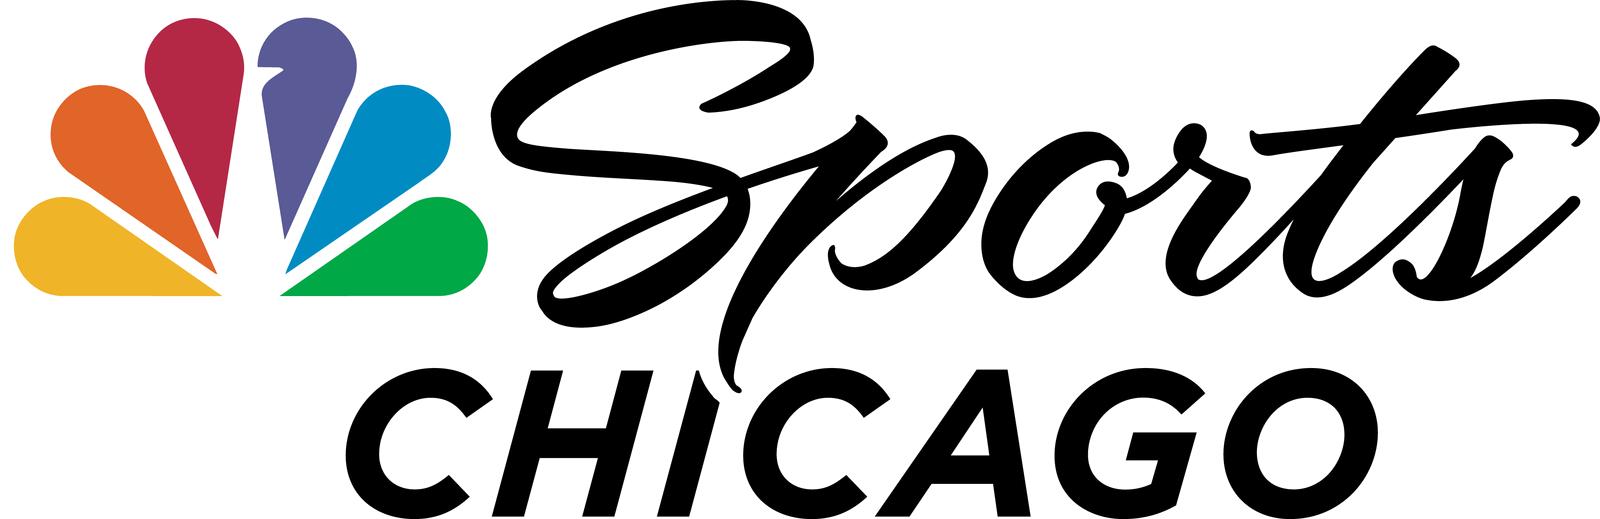 NBC SPORTS CHICAGO - ILLINOISNORTHERN INDIANASATURDAYS @ 9:00 AM